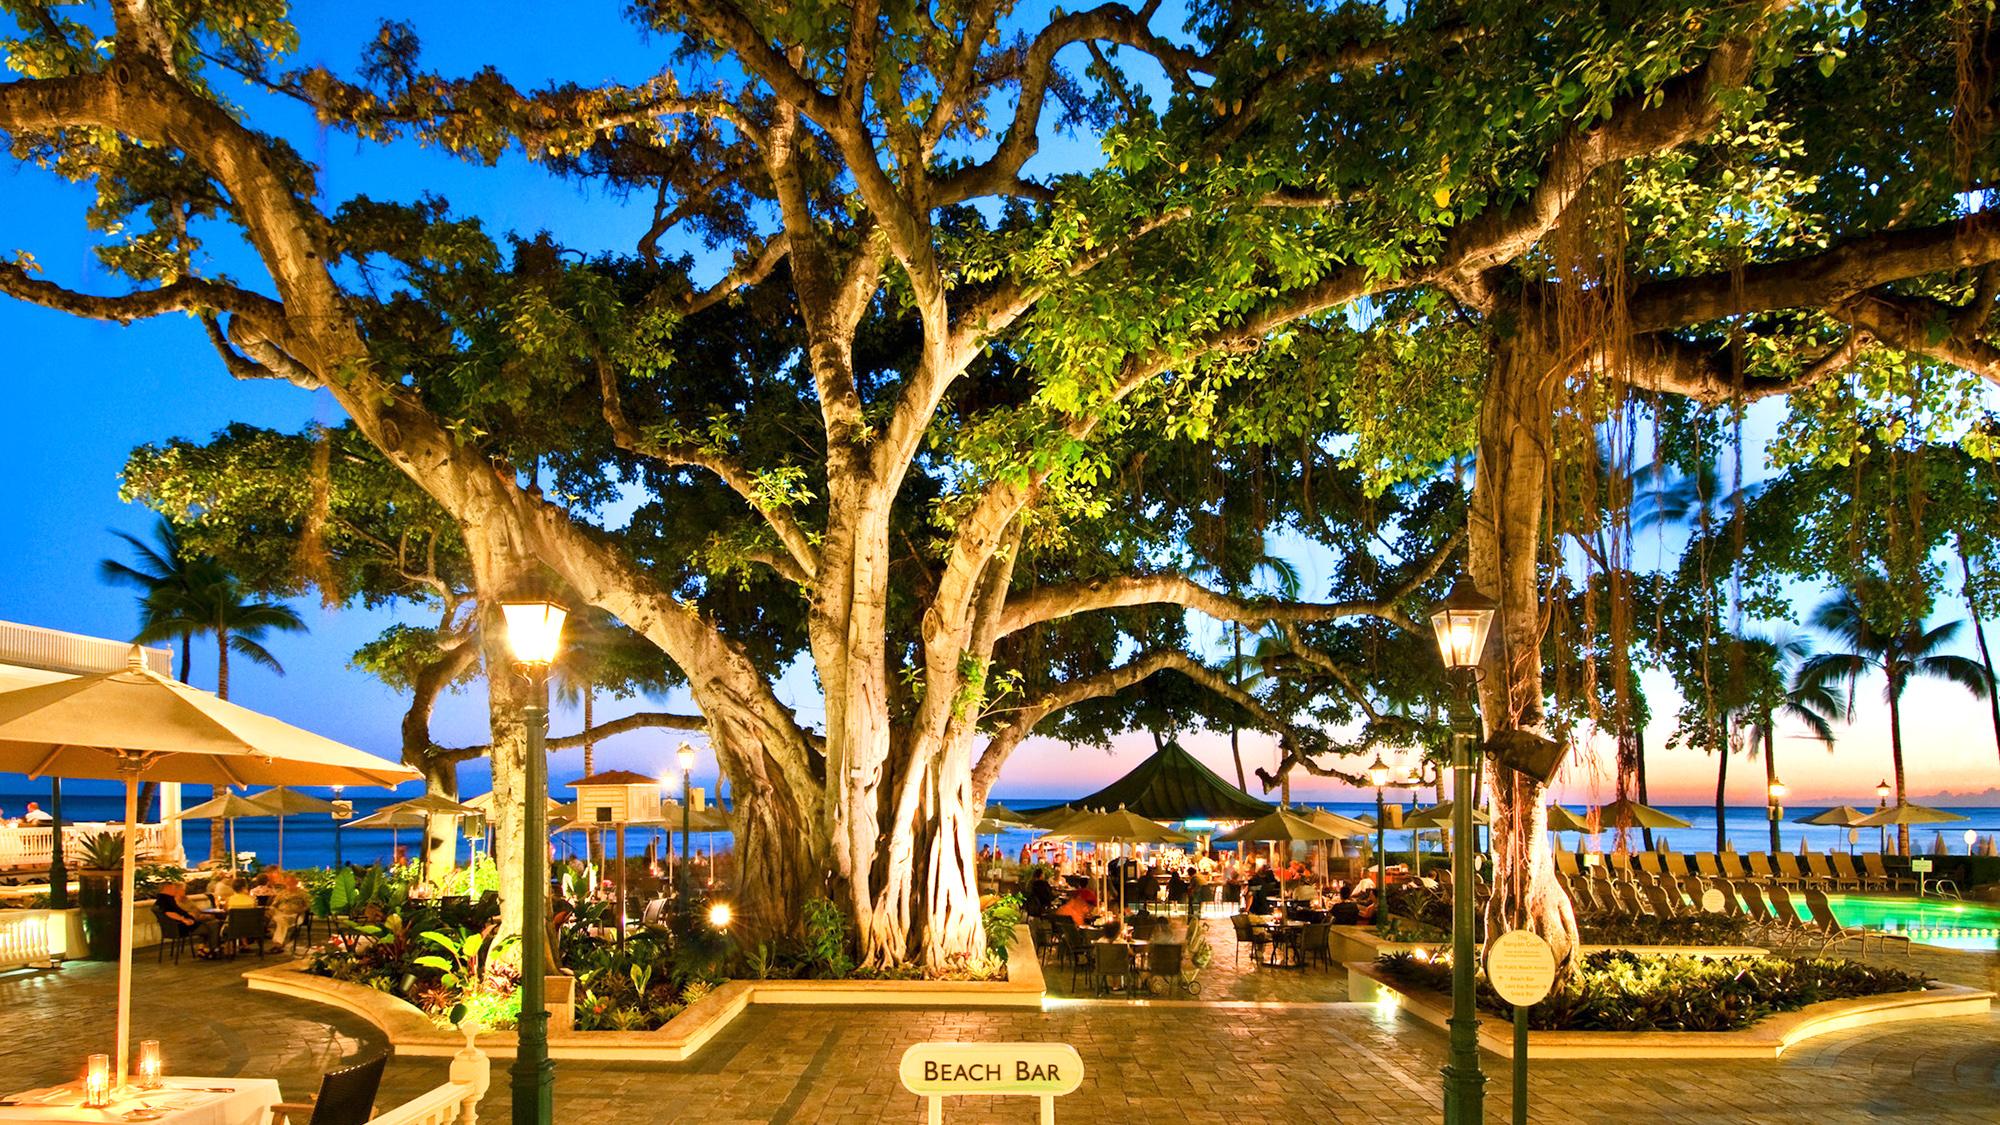 Waikiki S Moana Surfrider Kicks Off Monthly Concert Series July 31 Travel Weekly